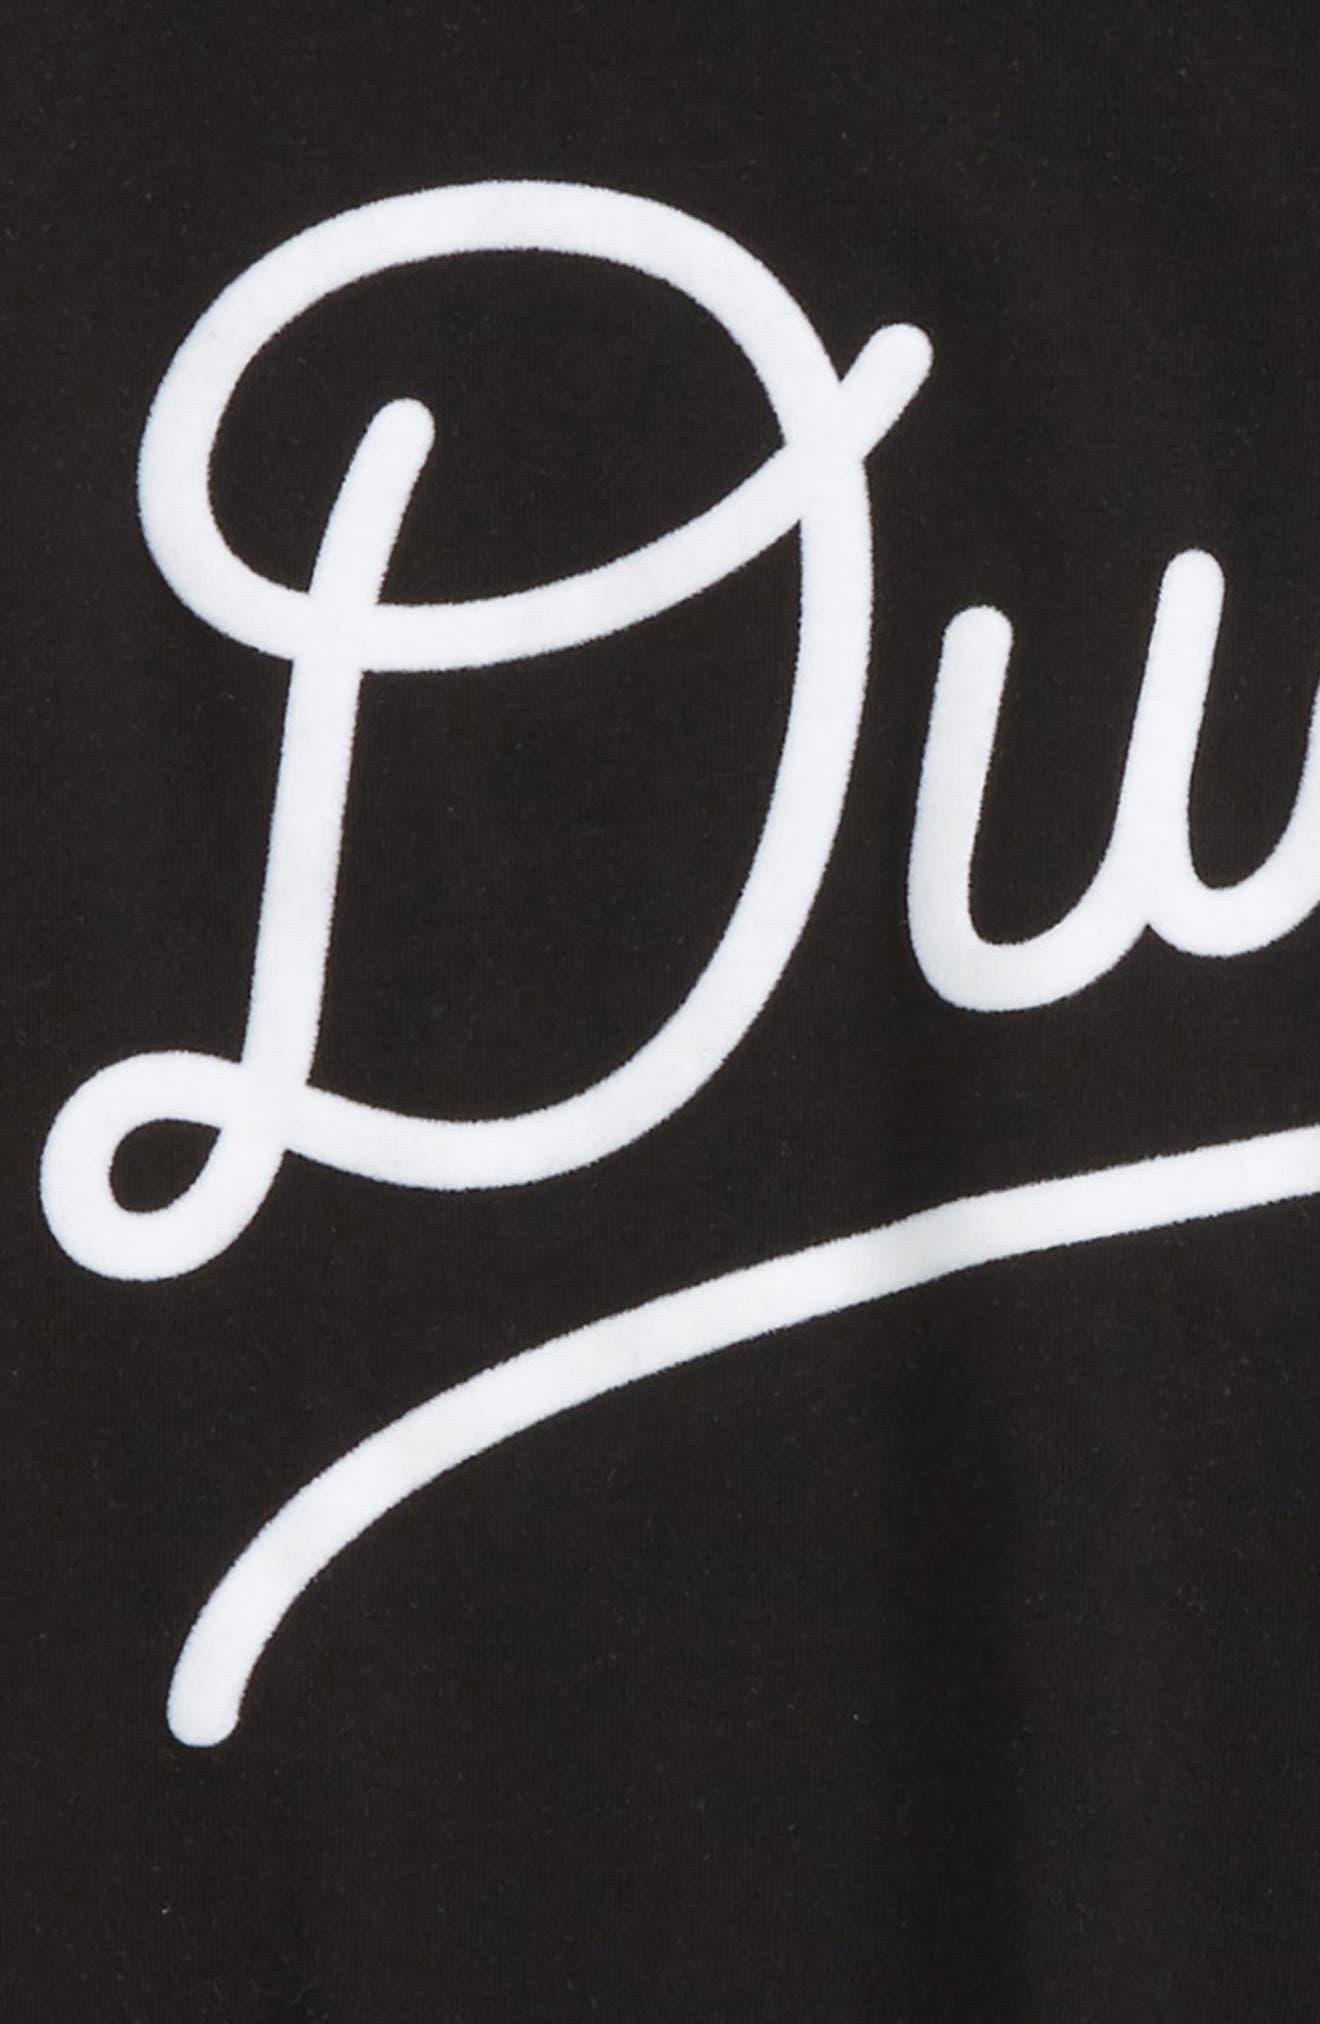 Alternate Image 2  - Peek Dude Appliqué T-Shirt (Toddler Boys, Little Boys & Big Boys)